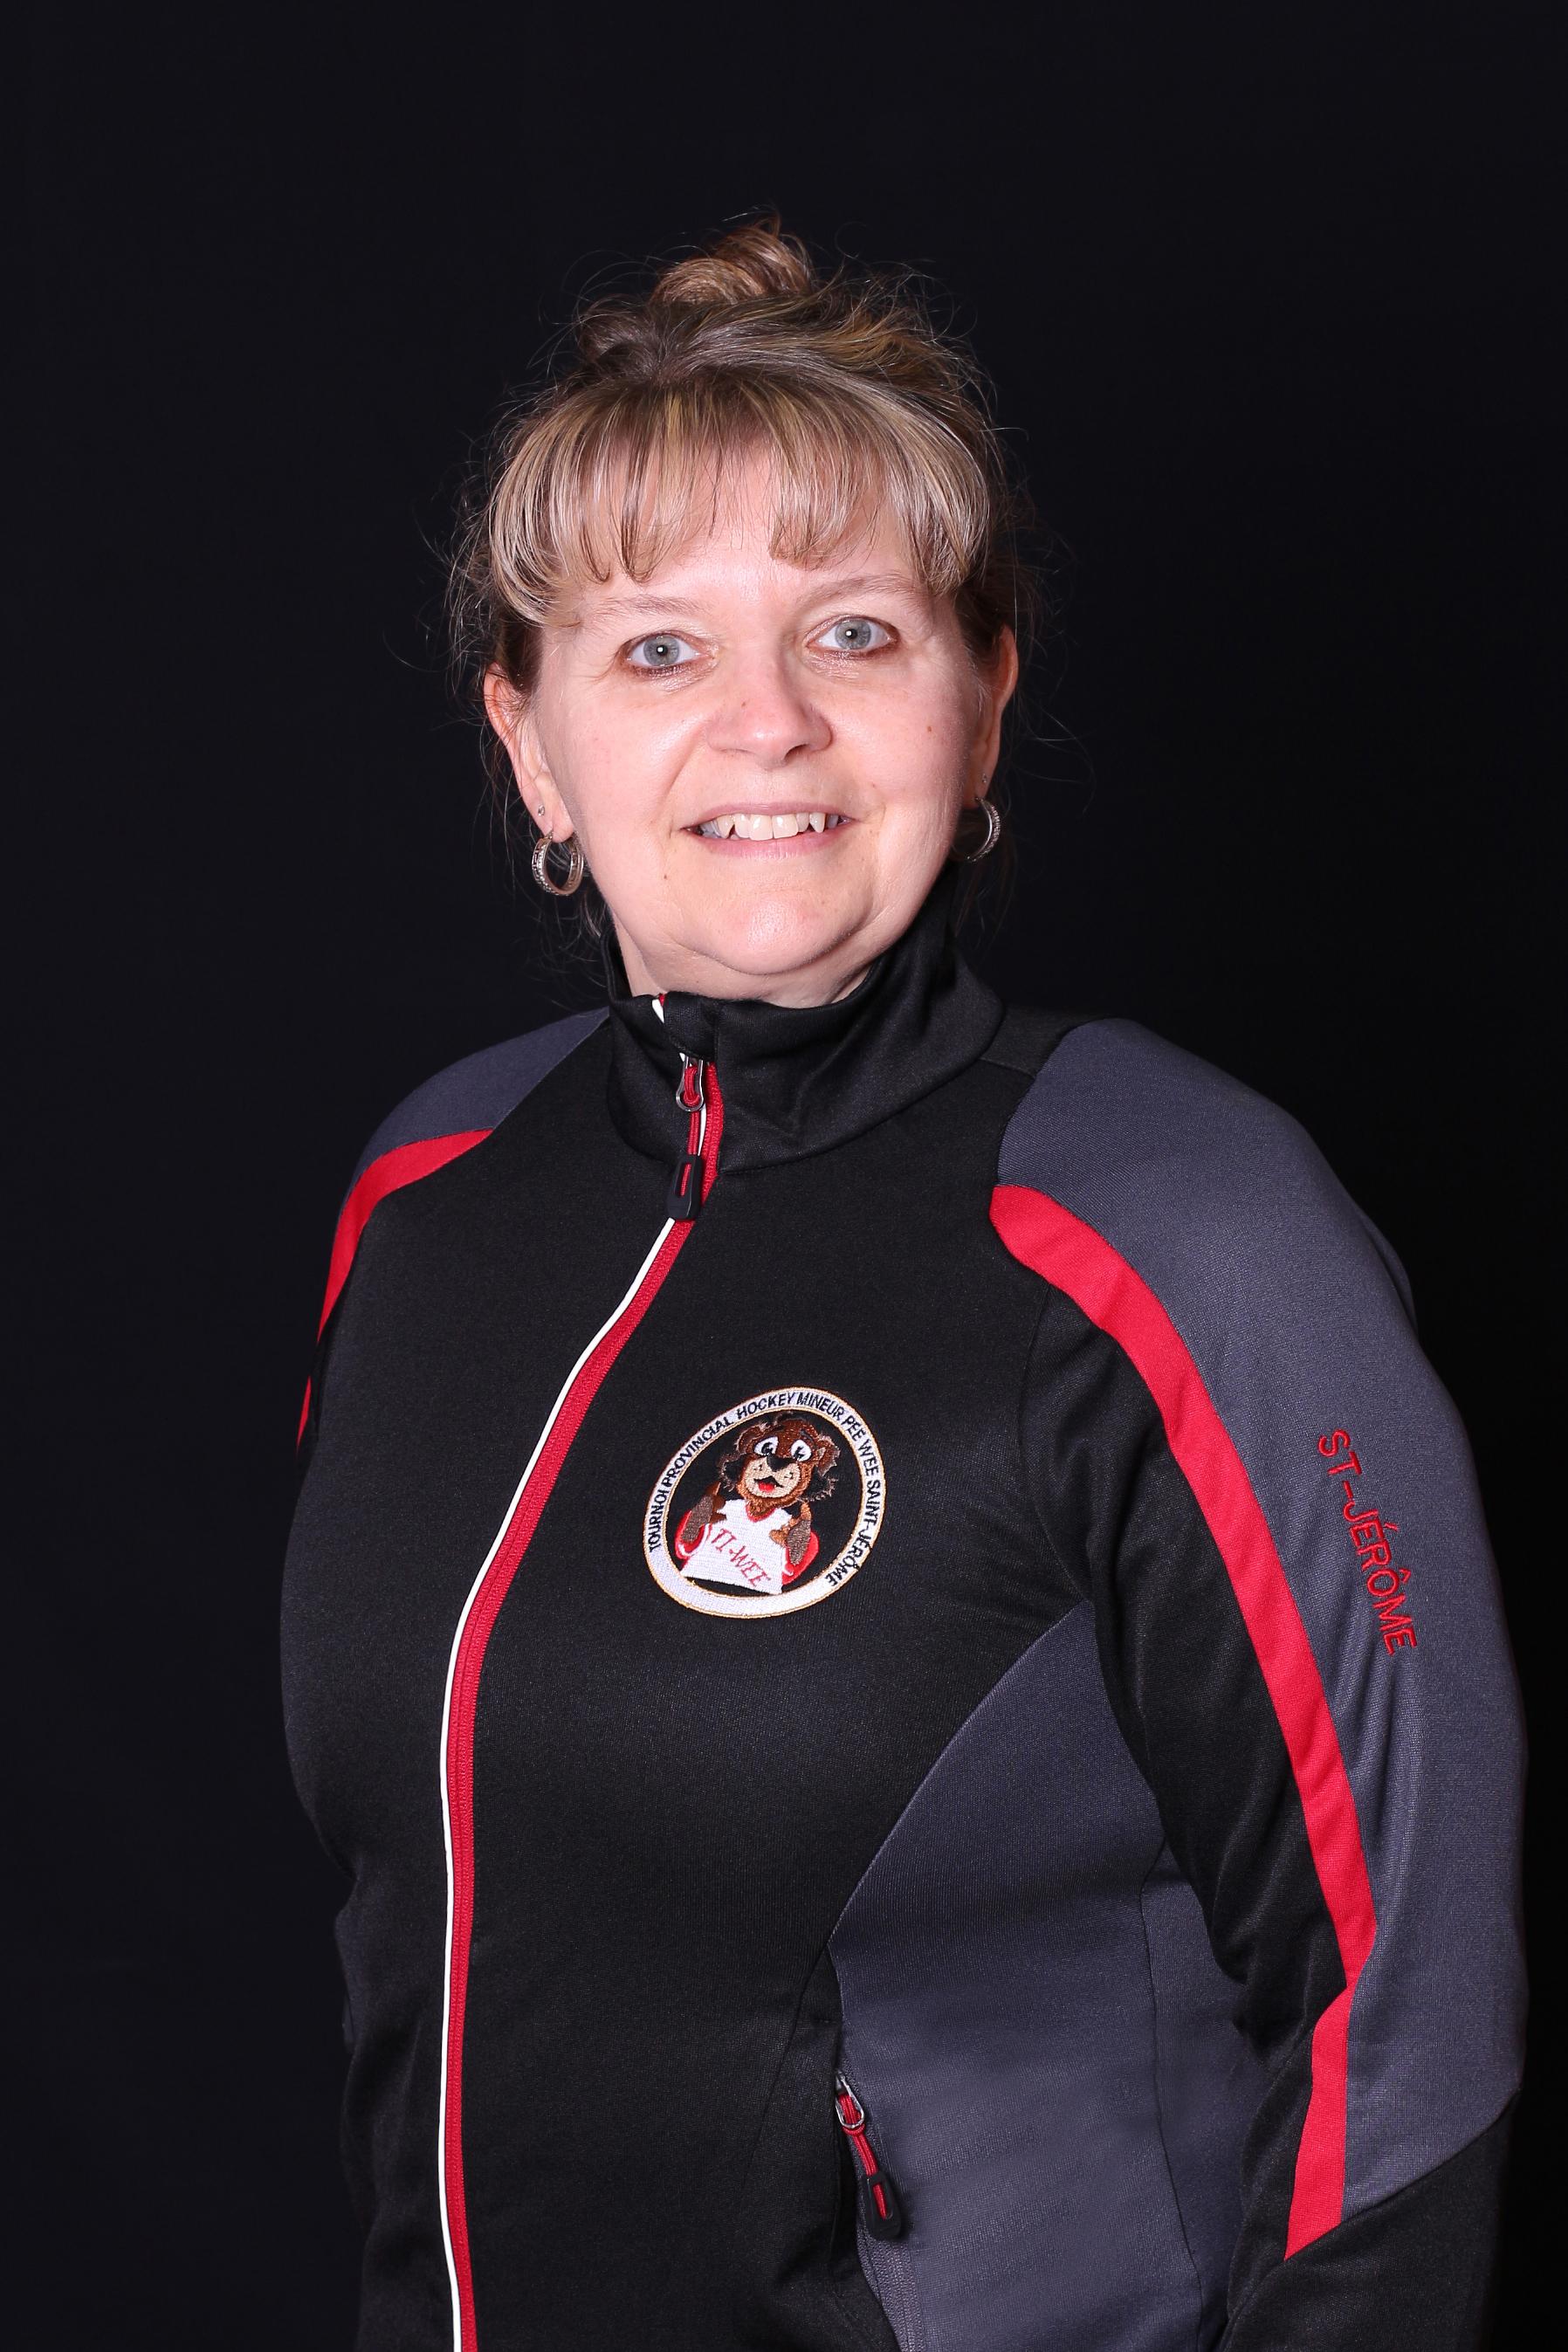 Nathalie Charette